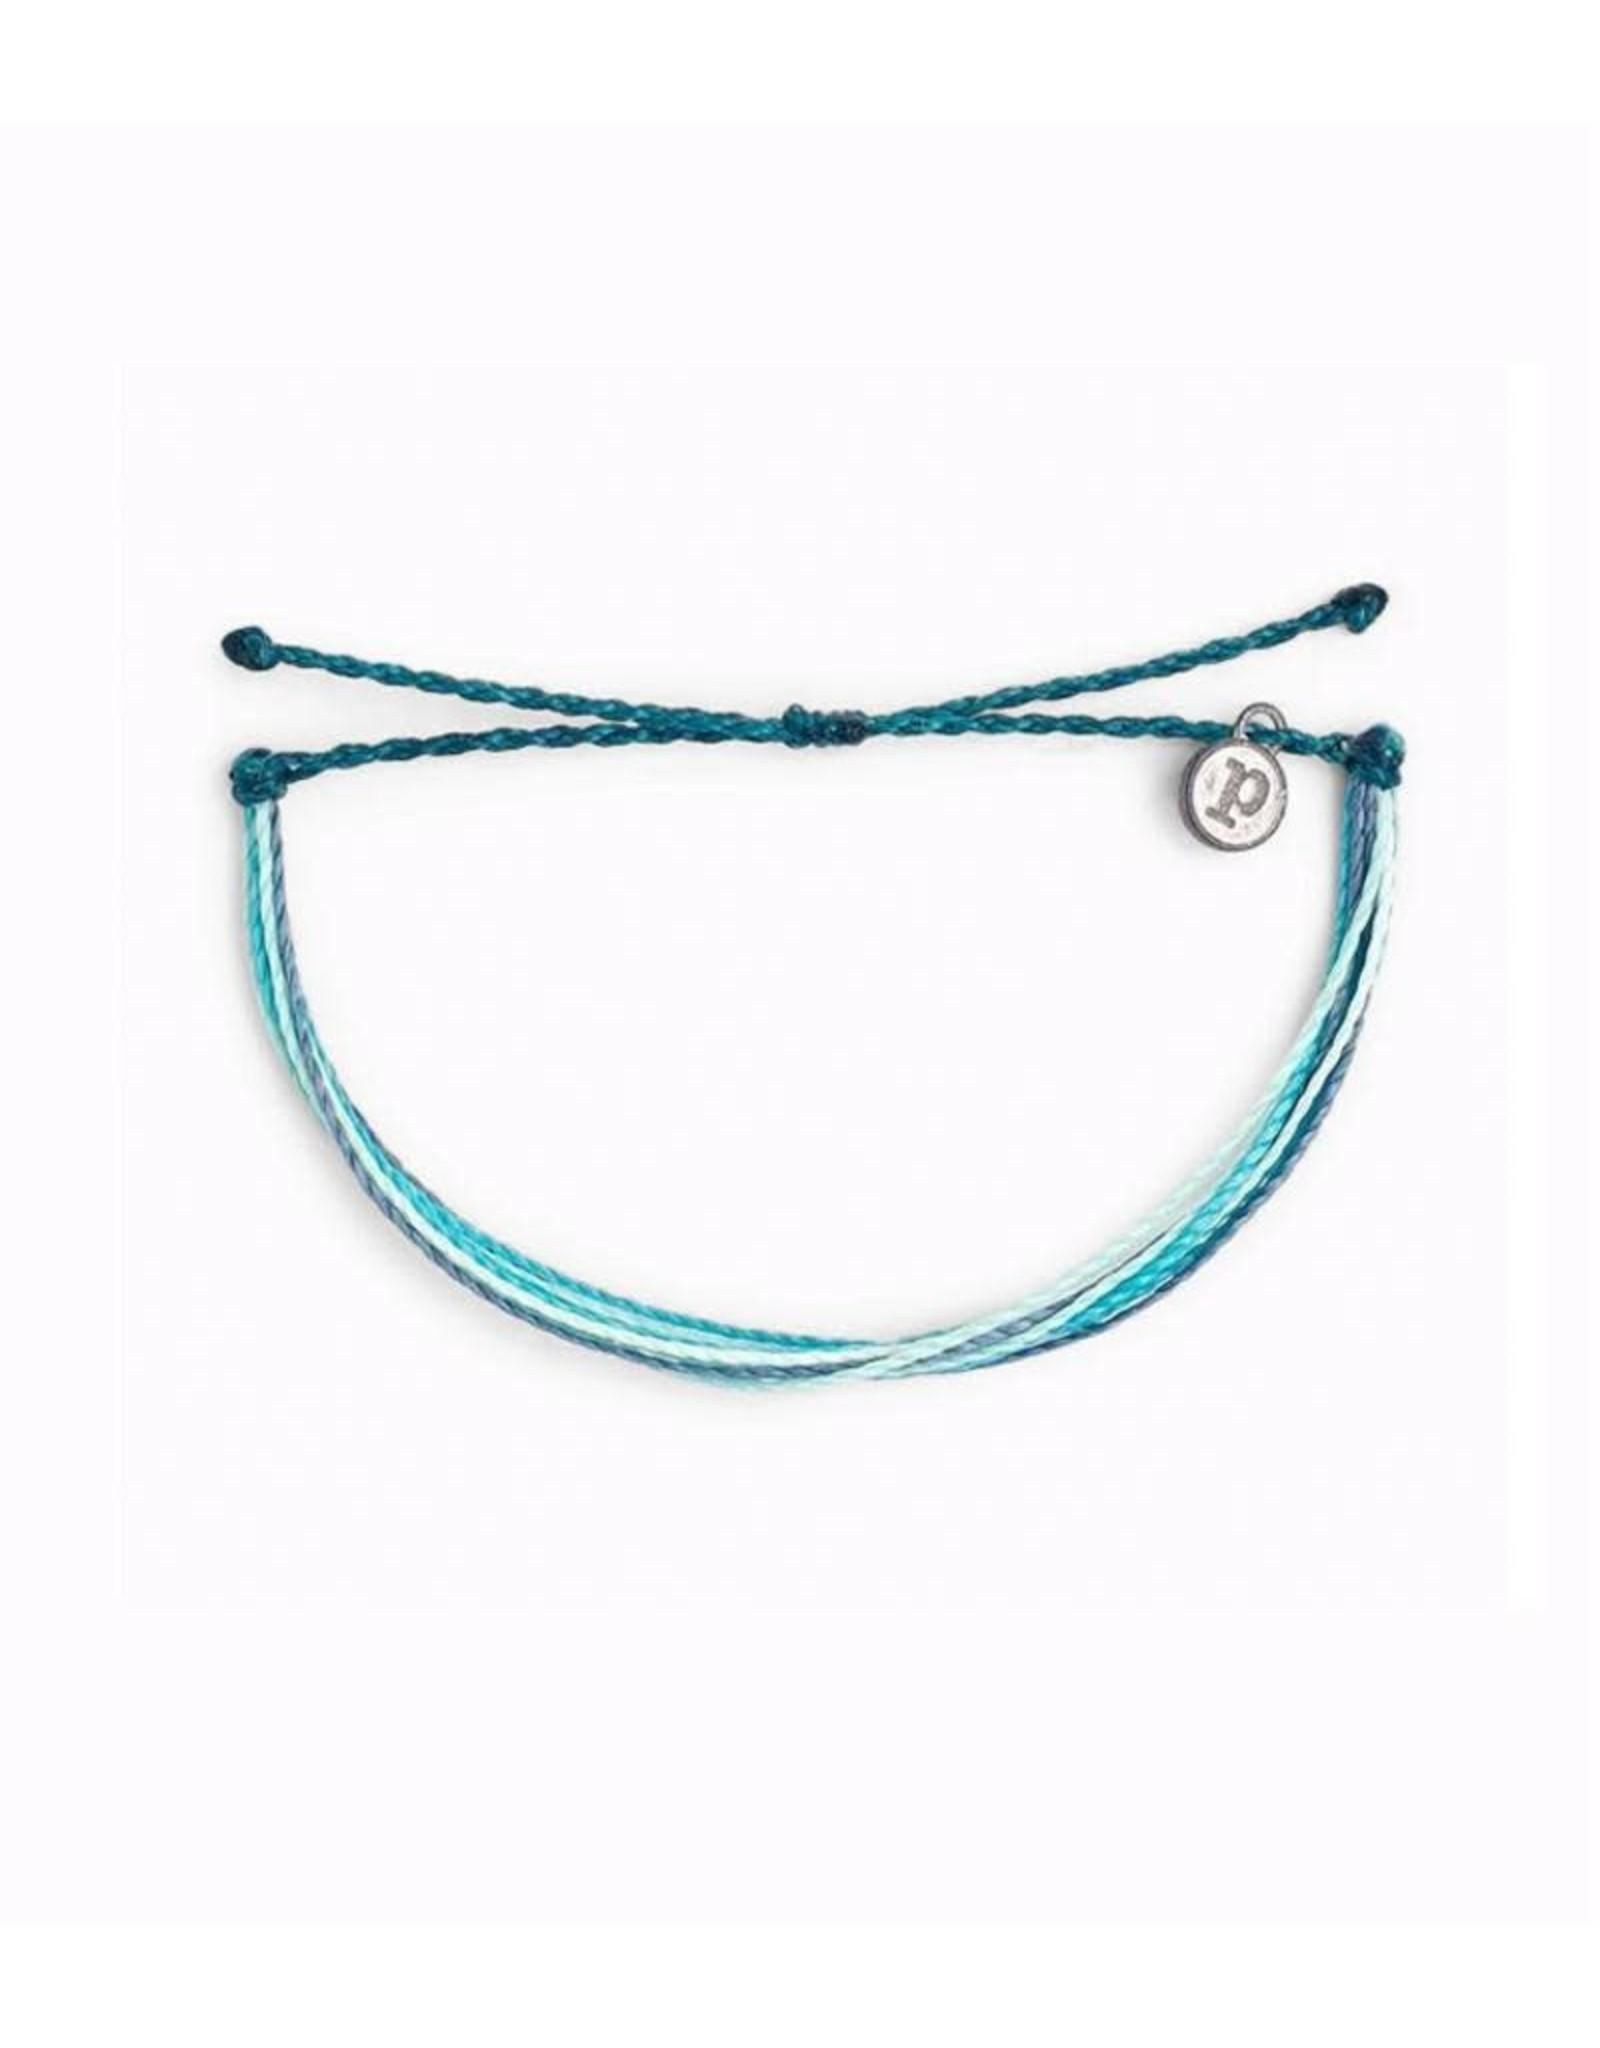 Pura Vida, Muted Original Bracelet, Marina